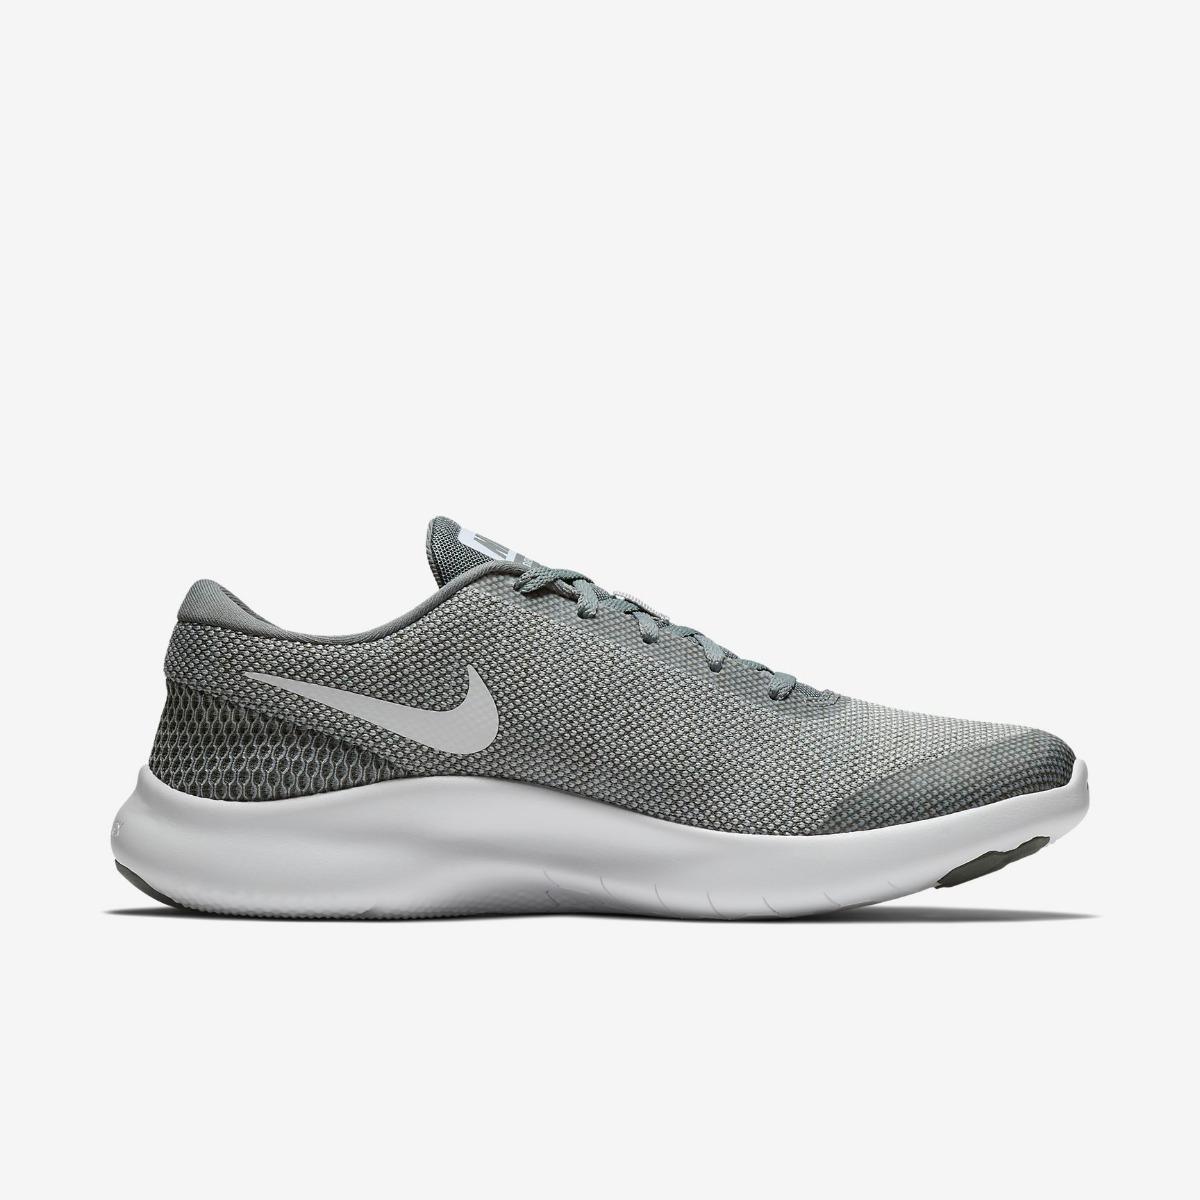 Zapatos Tenis Nike Flex Experience Rn 7 Hombre 100% Original